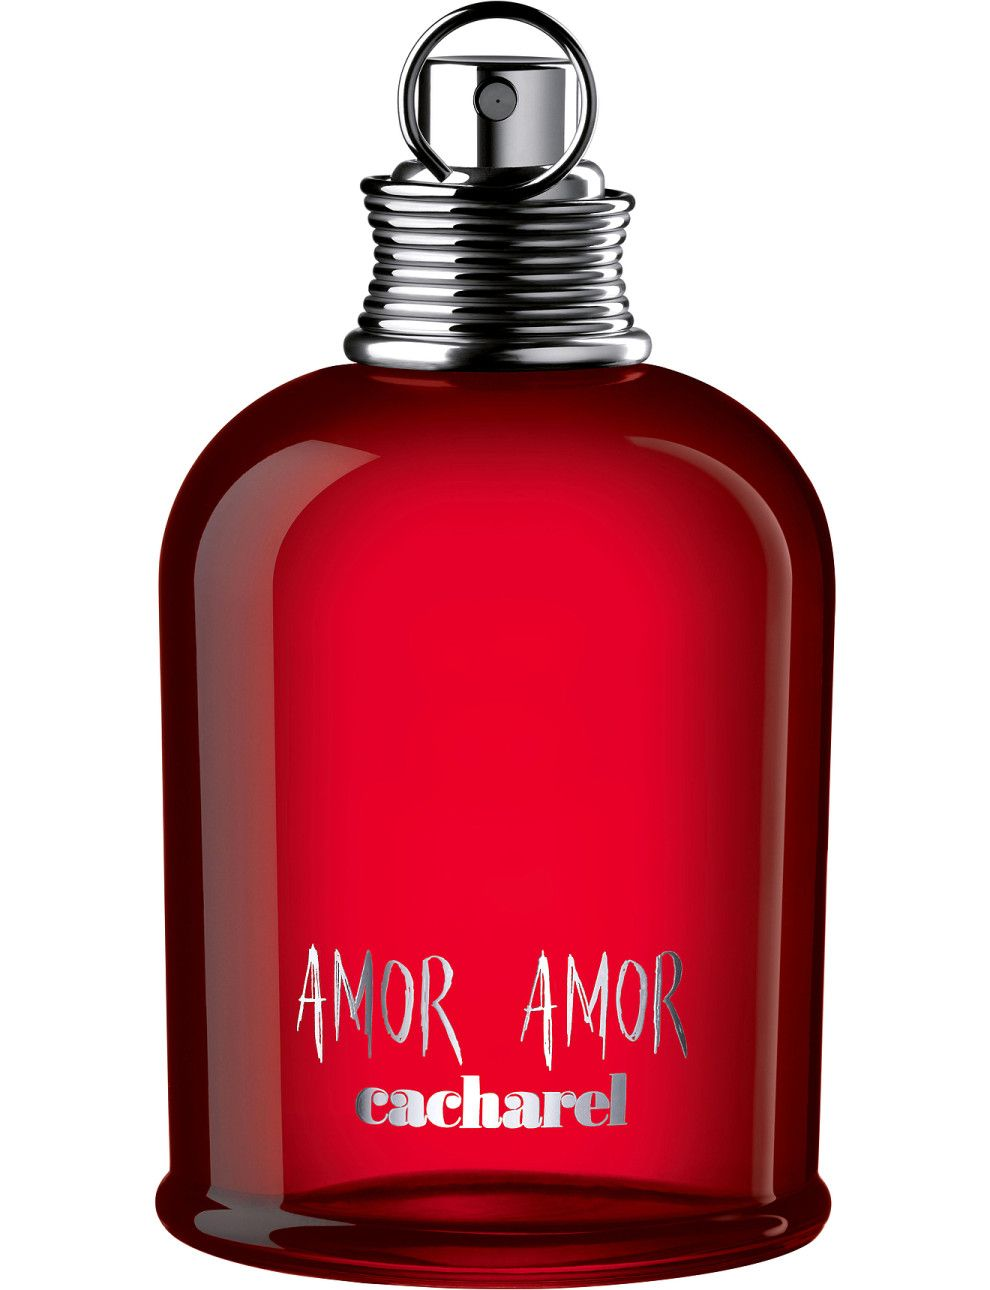 Amor Amor 30ml Edtv David Jones Cacharel Perfume Perfume Fragrance